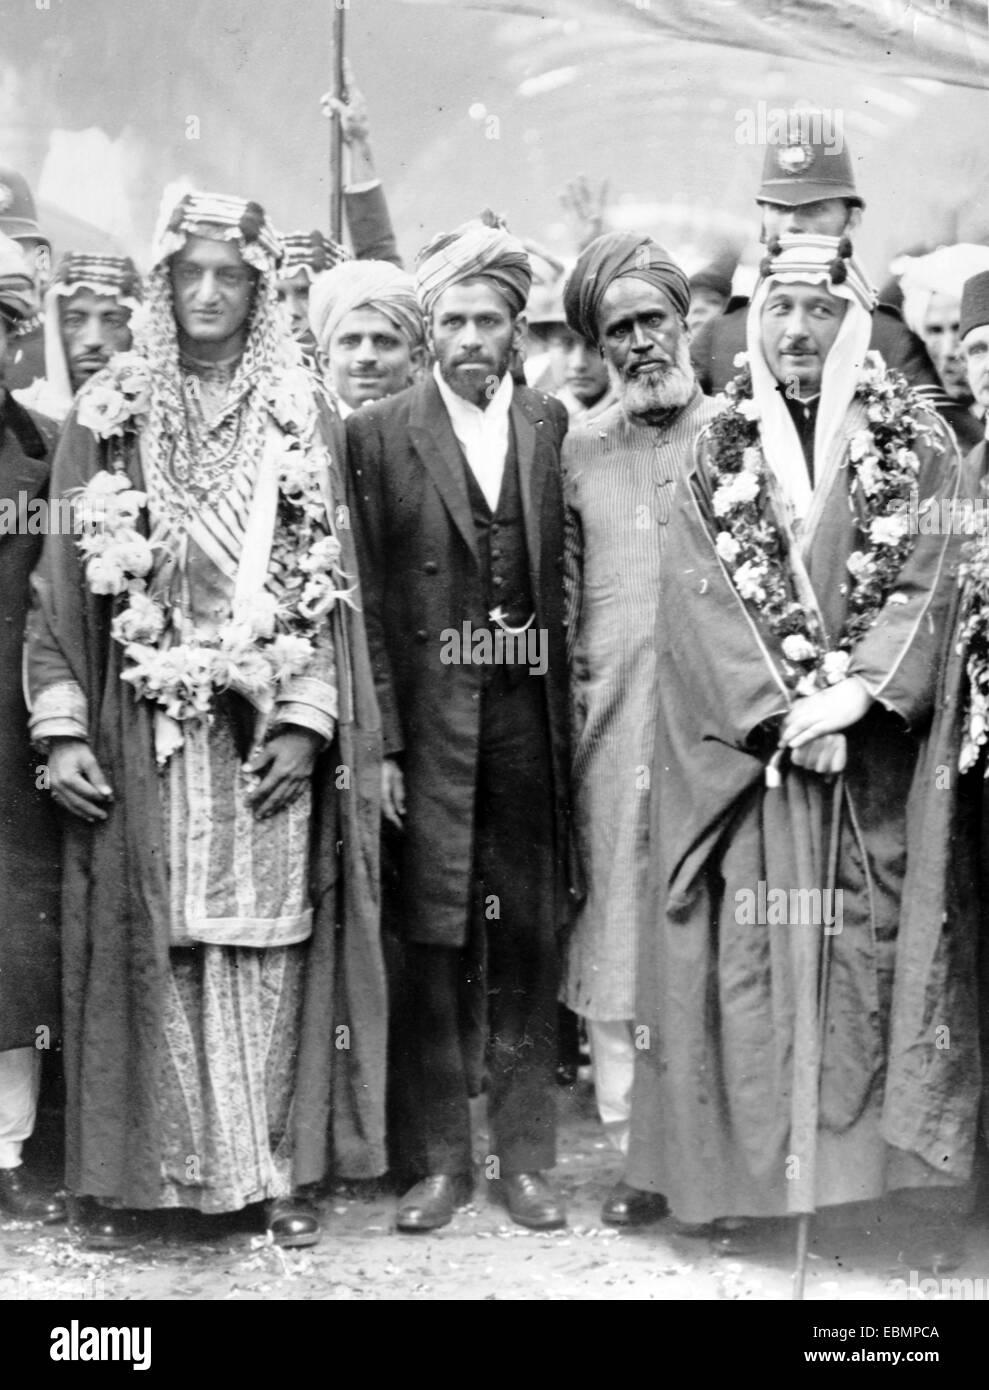 Crown Prince of Saudi Arabia, Faisal bin Adbulaziz al Saud (to left), later Monarch or King of Saudi Arabia, on - Stock Image